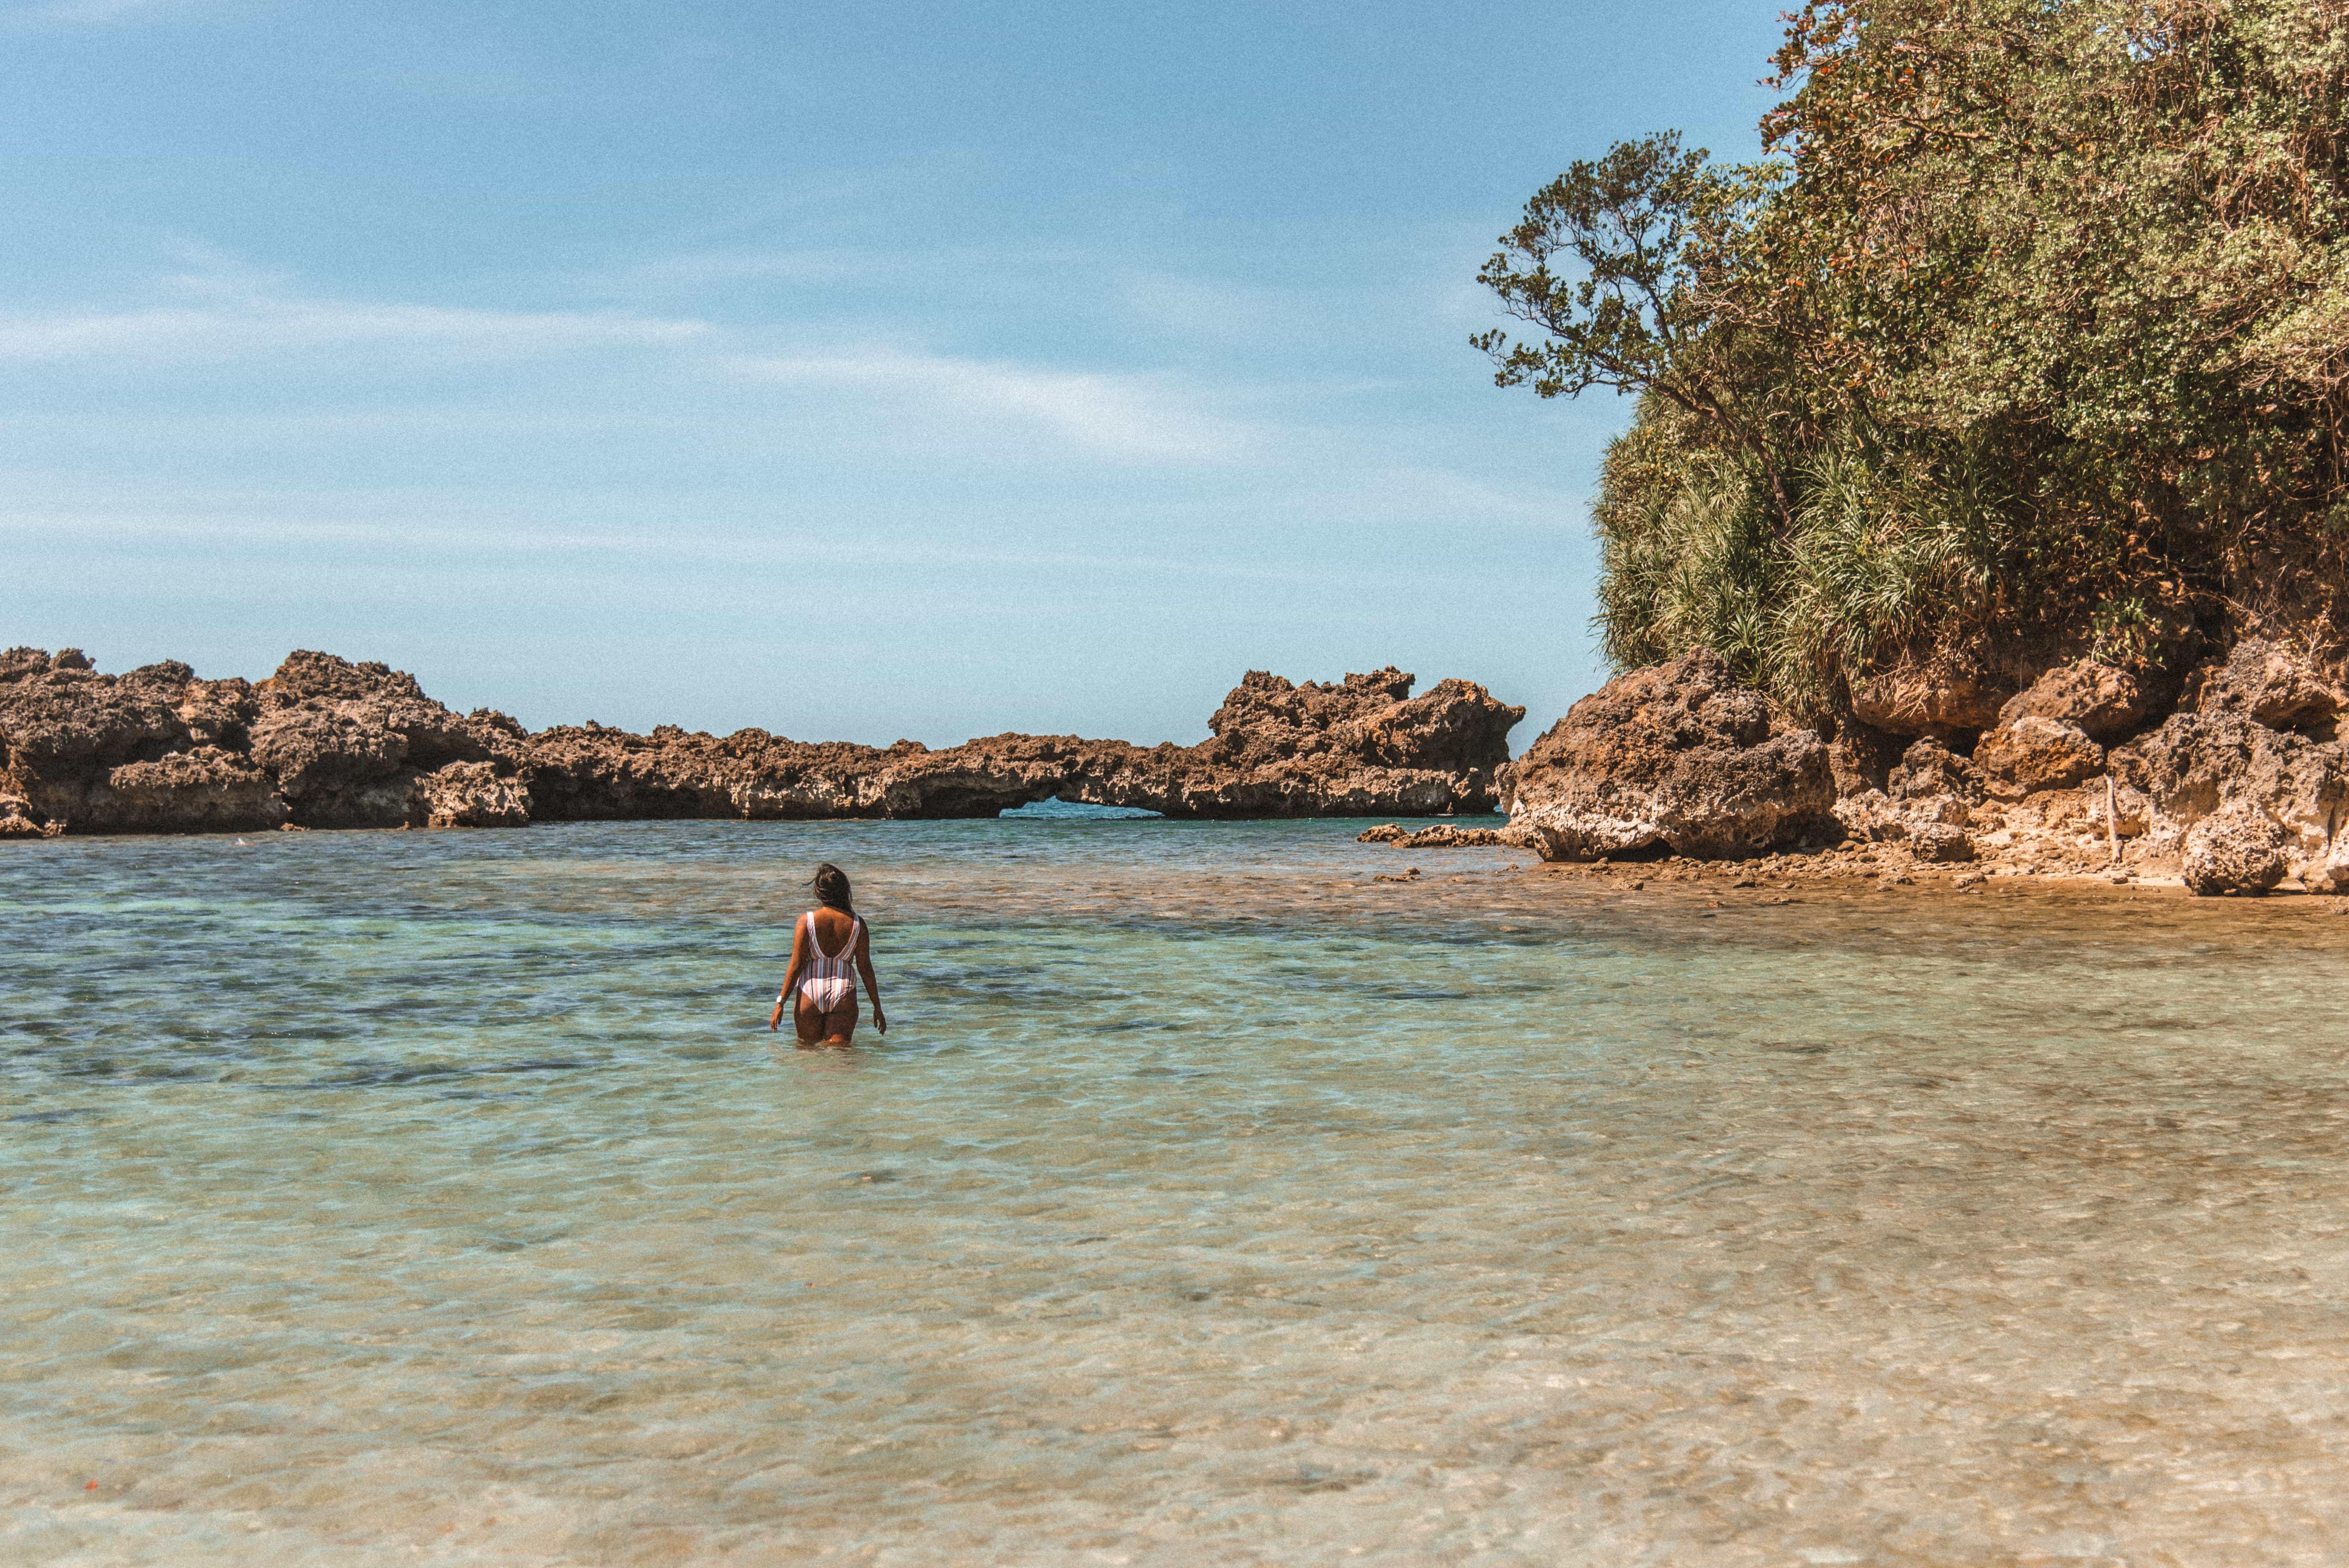 Ave Maria Island, Guimaras Island, Guimaras tourist spots, Guimaras Island tour, Guimaras Island travel guide, where to go in Guimaras Island